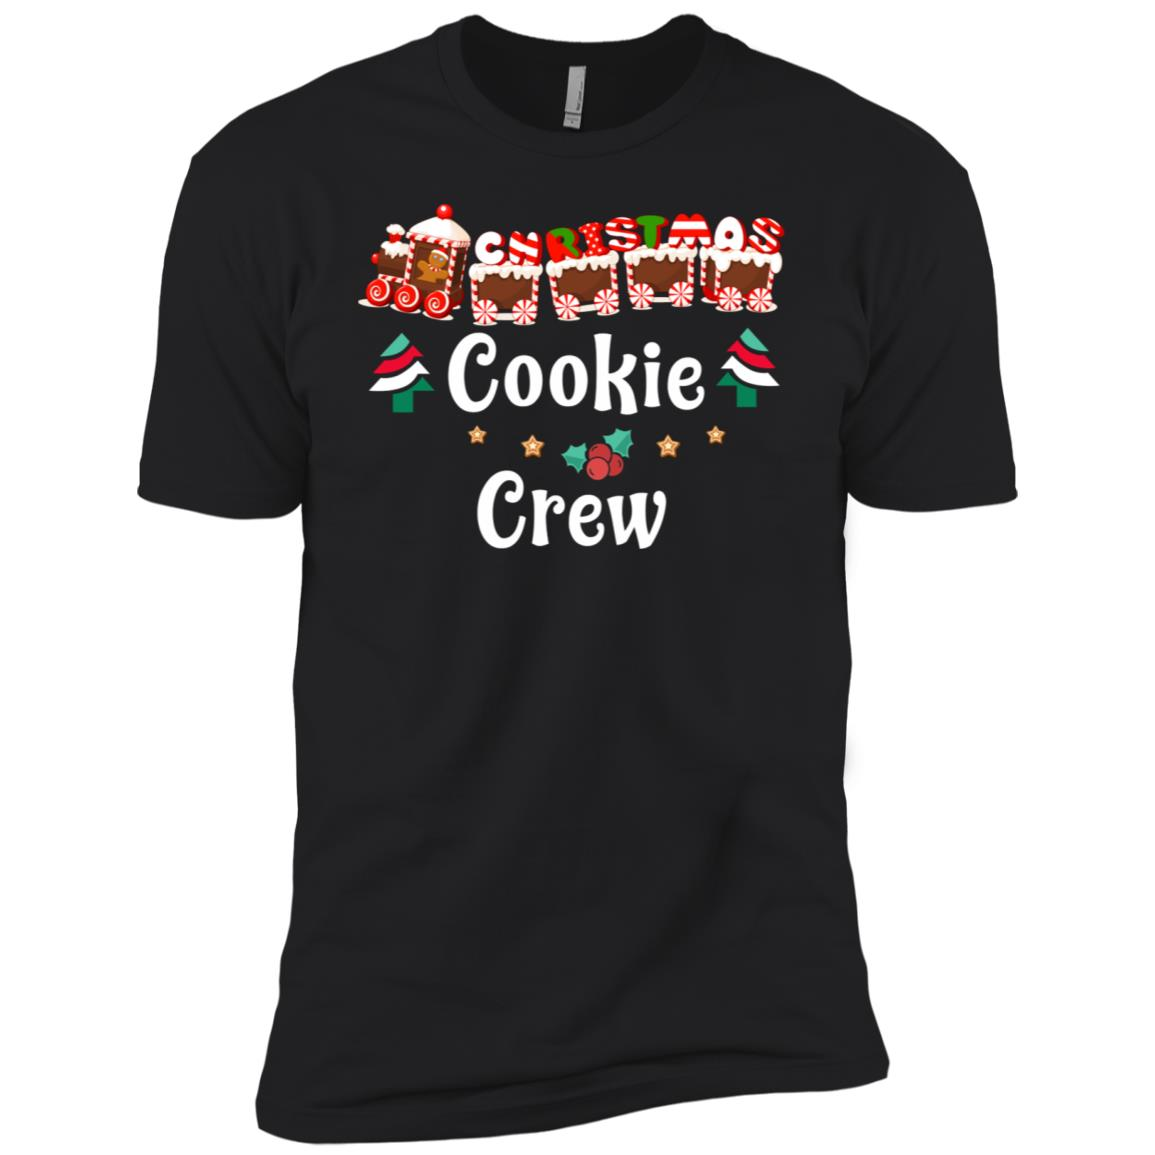 Christmas Baking Team Cookie Crew Bakers Tee Men Short Sleeve T-Shirt